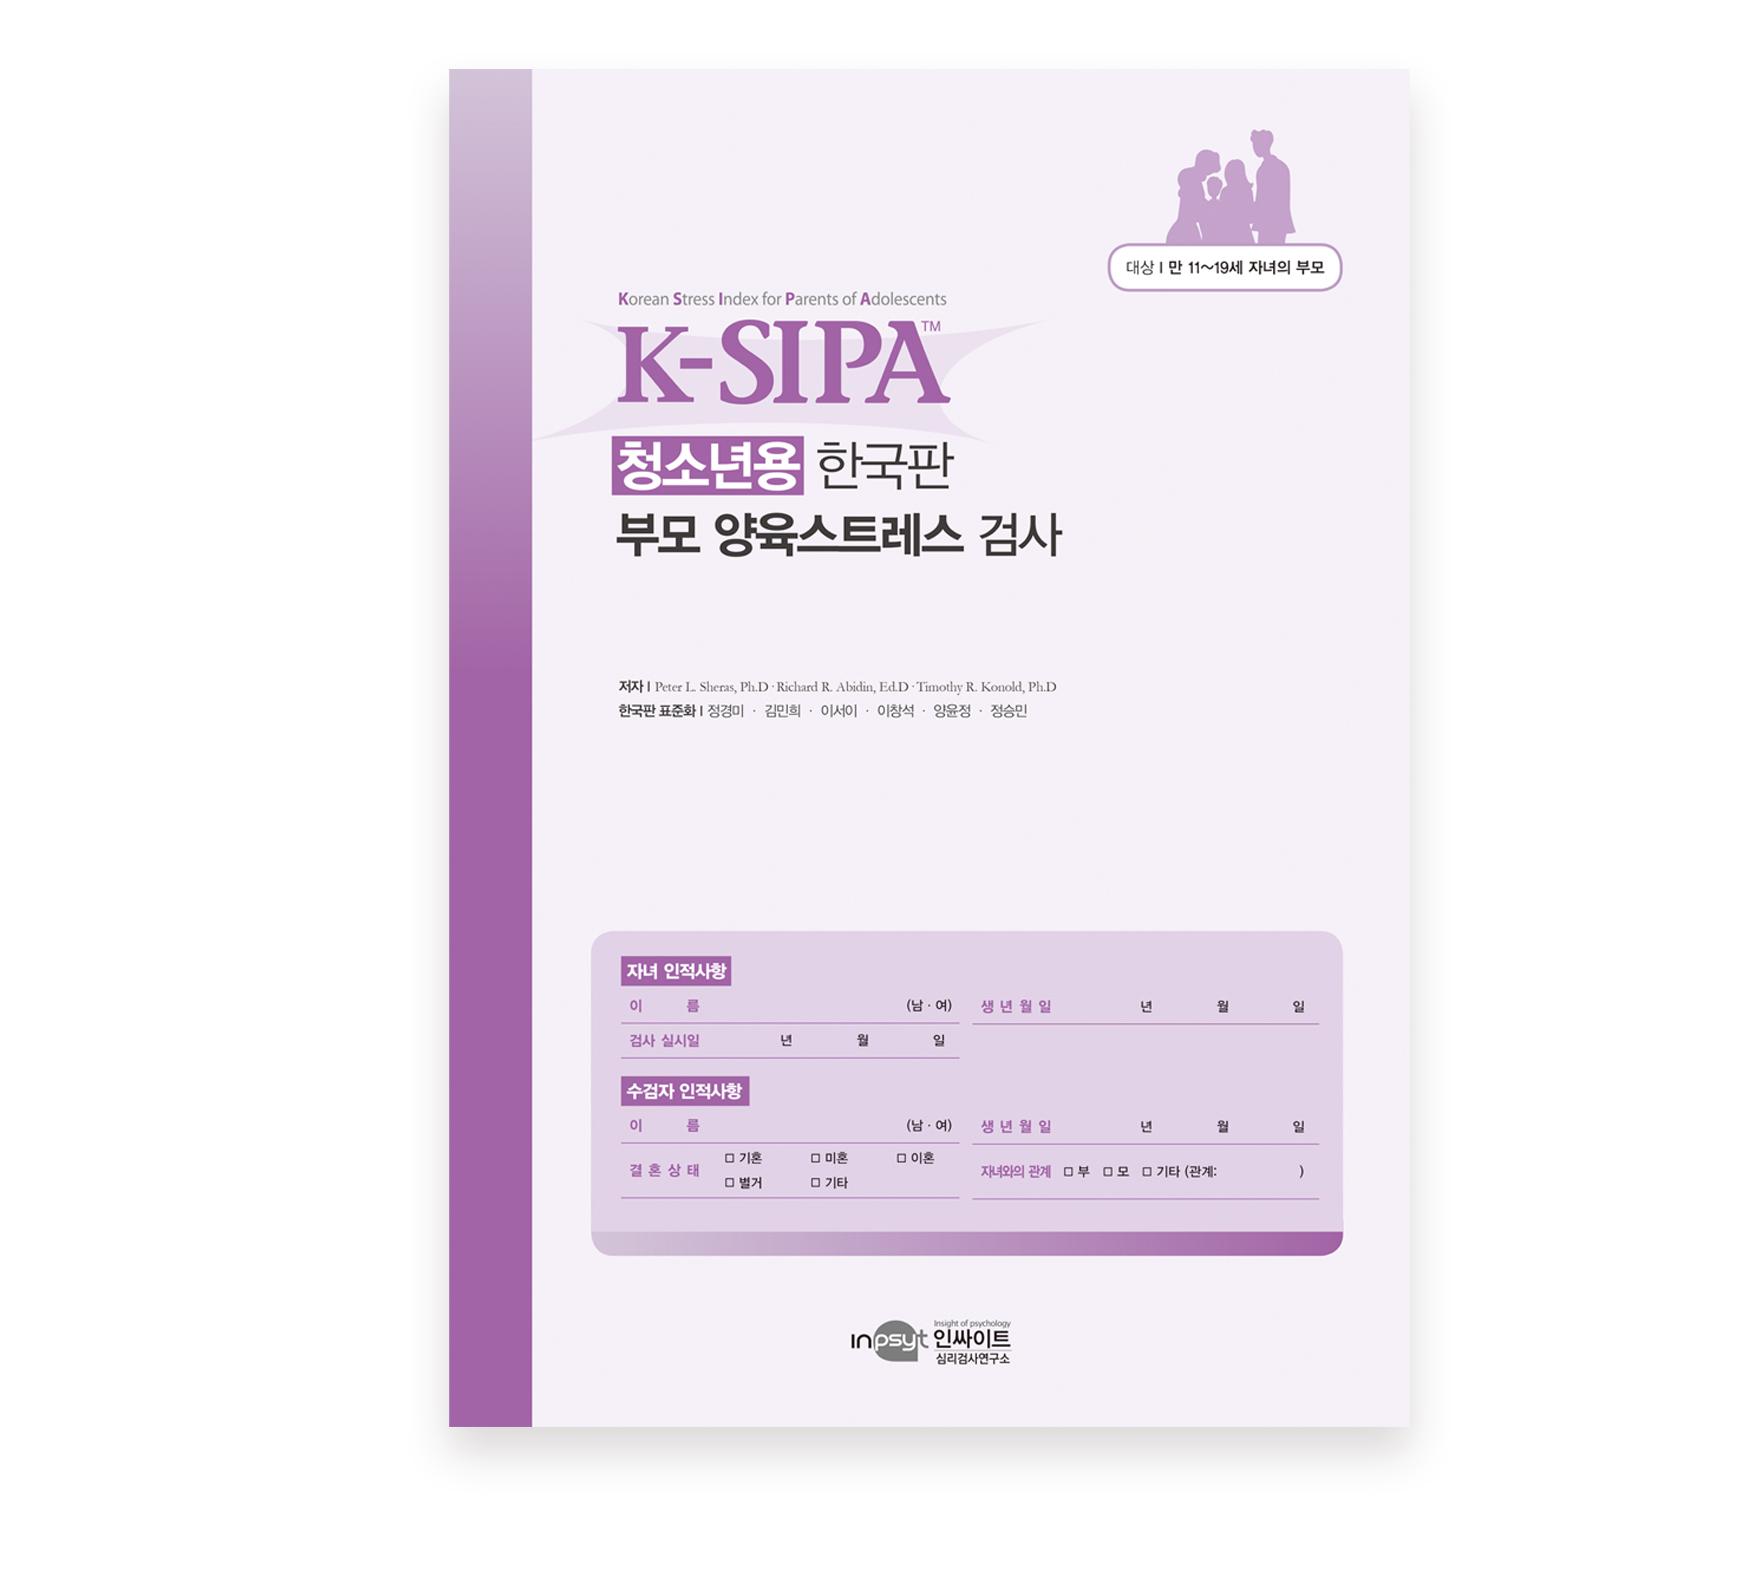 K-SIPA청소년용한국판부모양육스트레스검사[웹용]-검사지.jpg